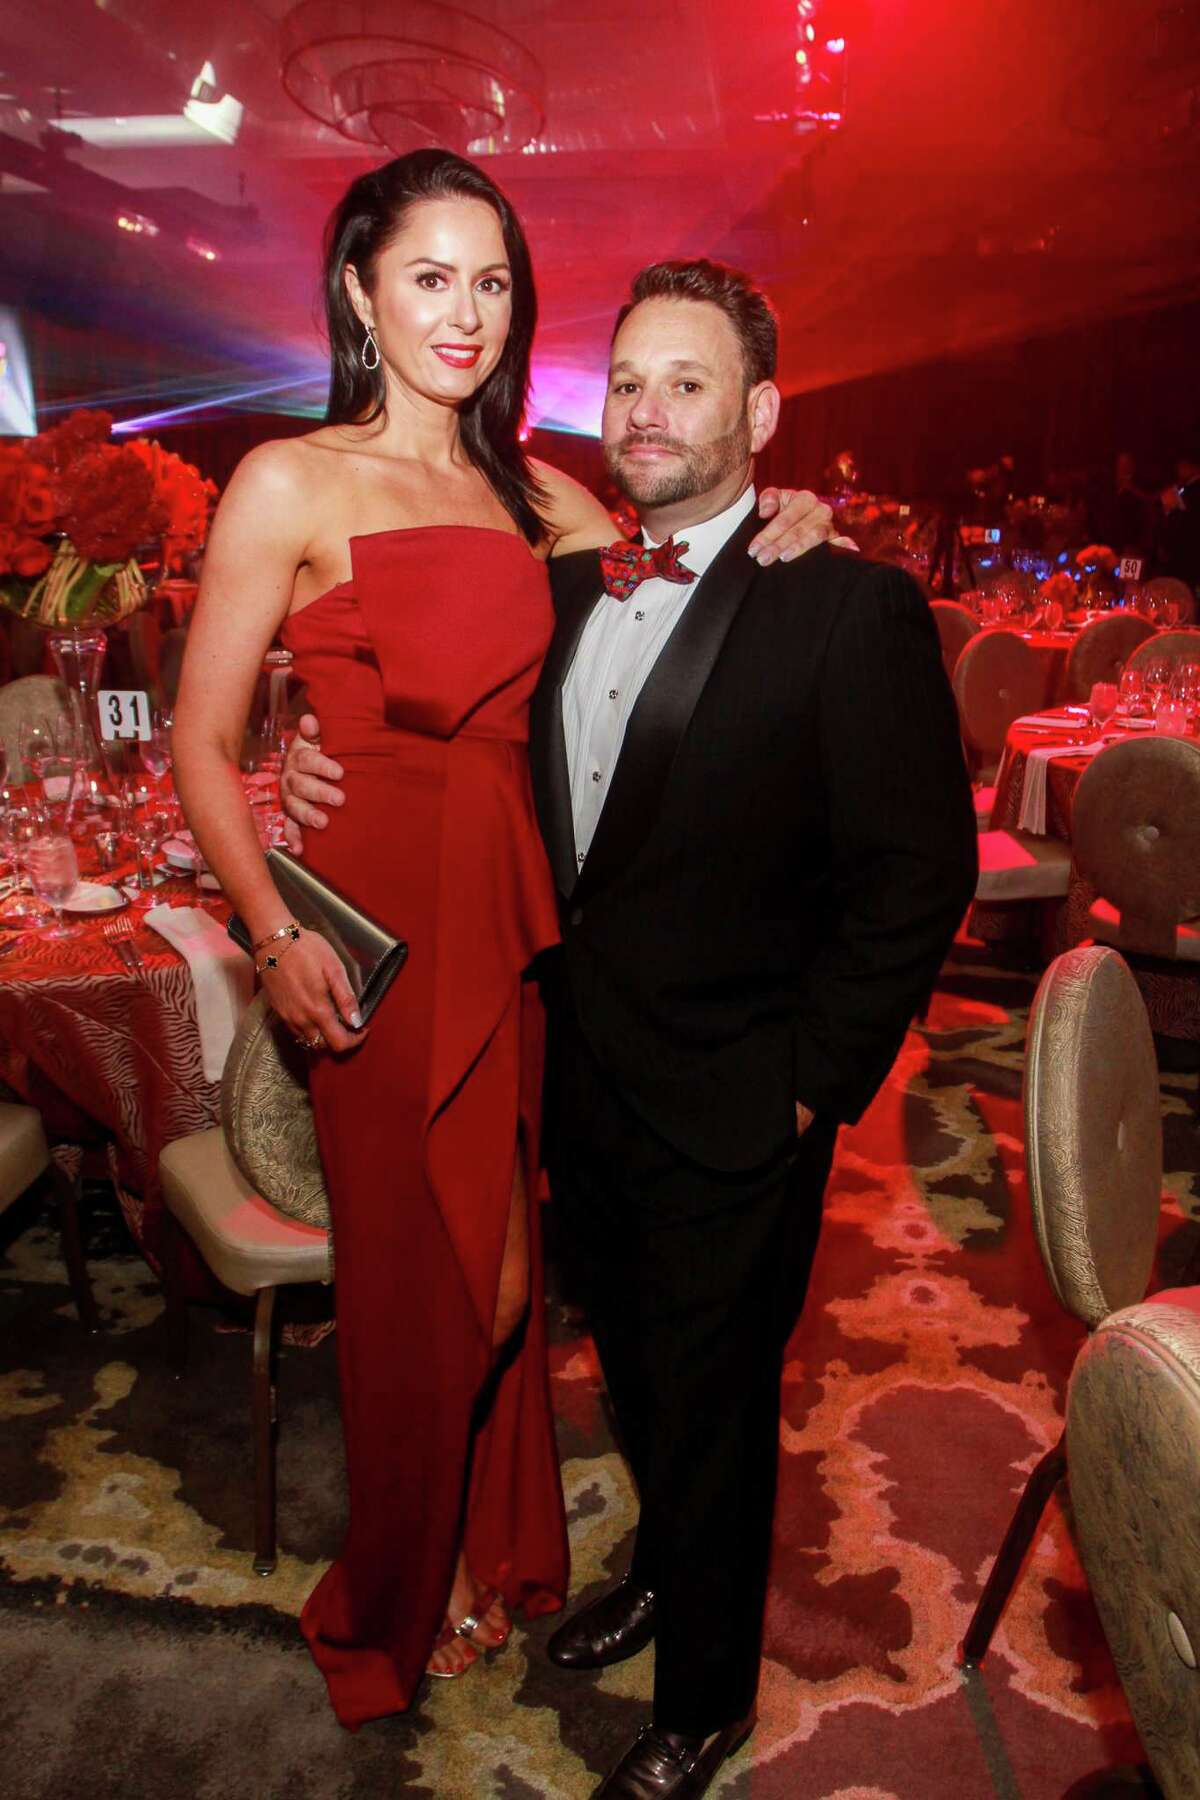 Veronica Nemeth and Tommy Kuranoff at Houston Children's Charity's 22nd annual gala.